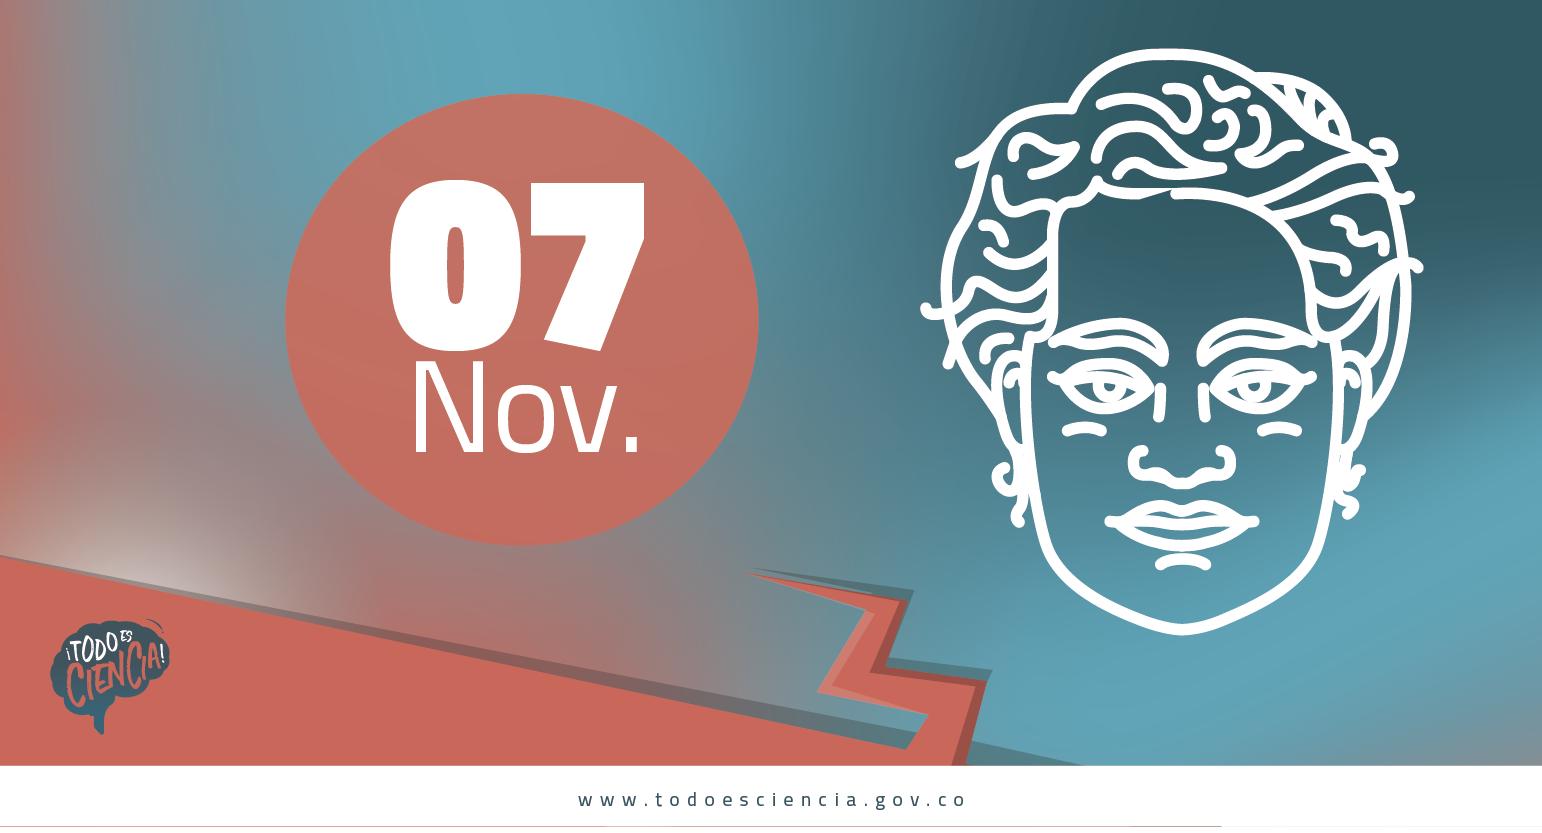 Efemérides: 07 de noviembre  Nace Marie Curie